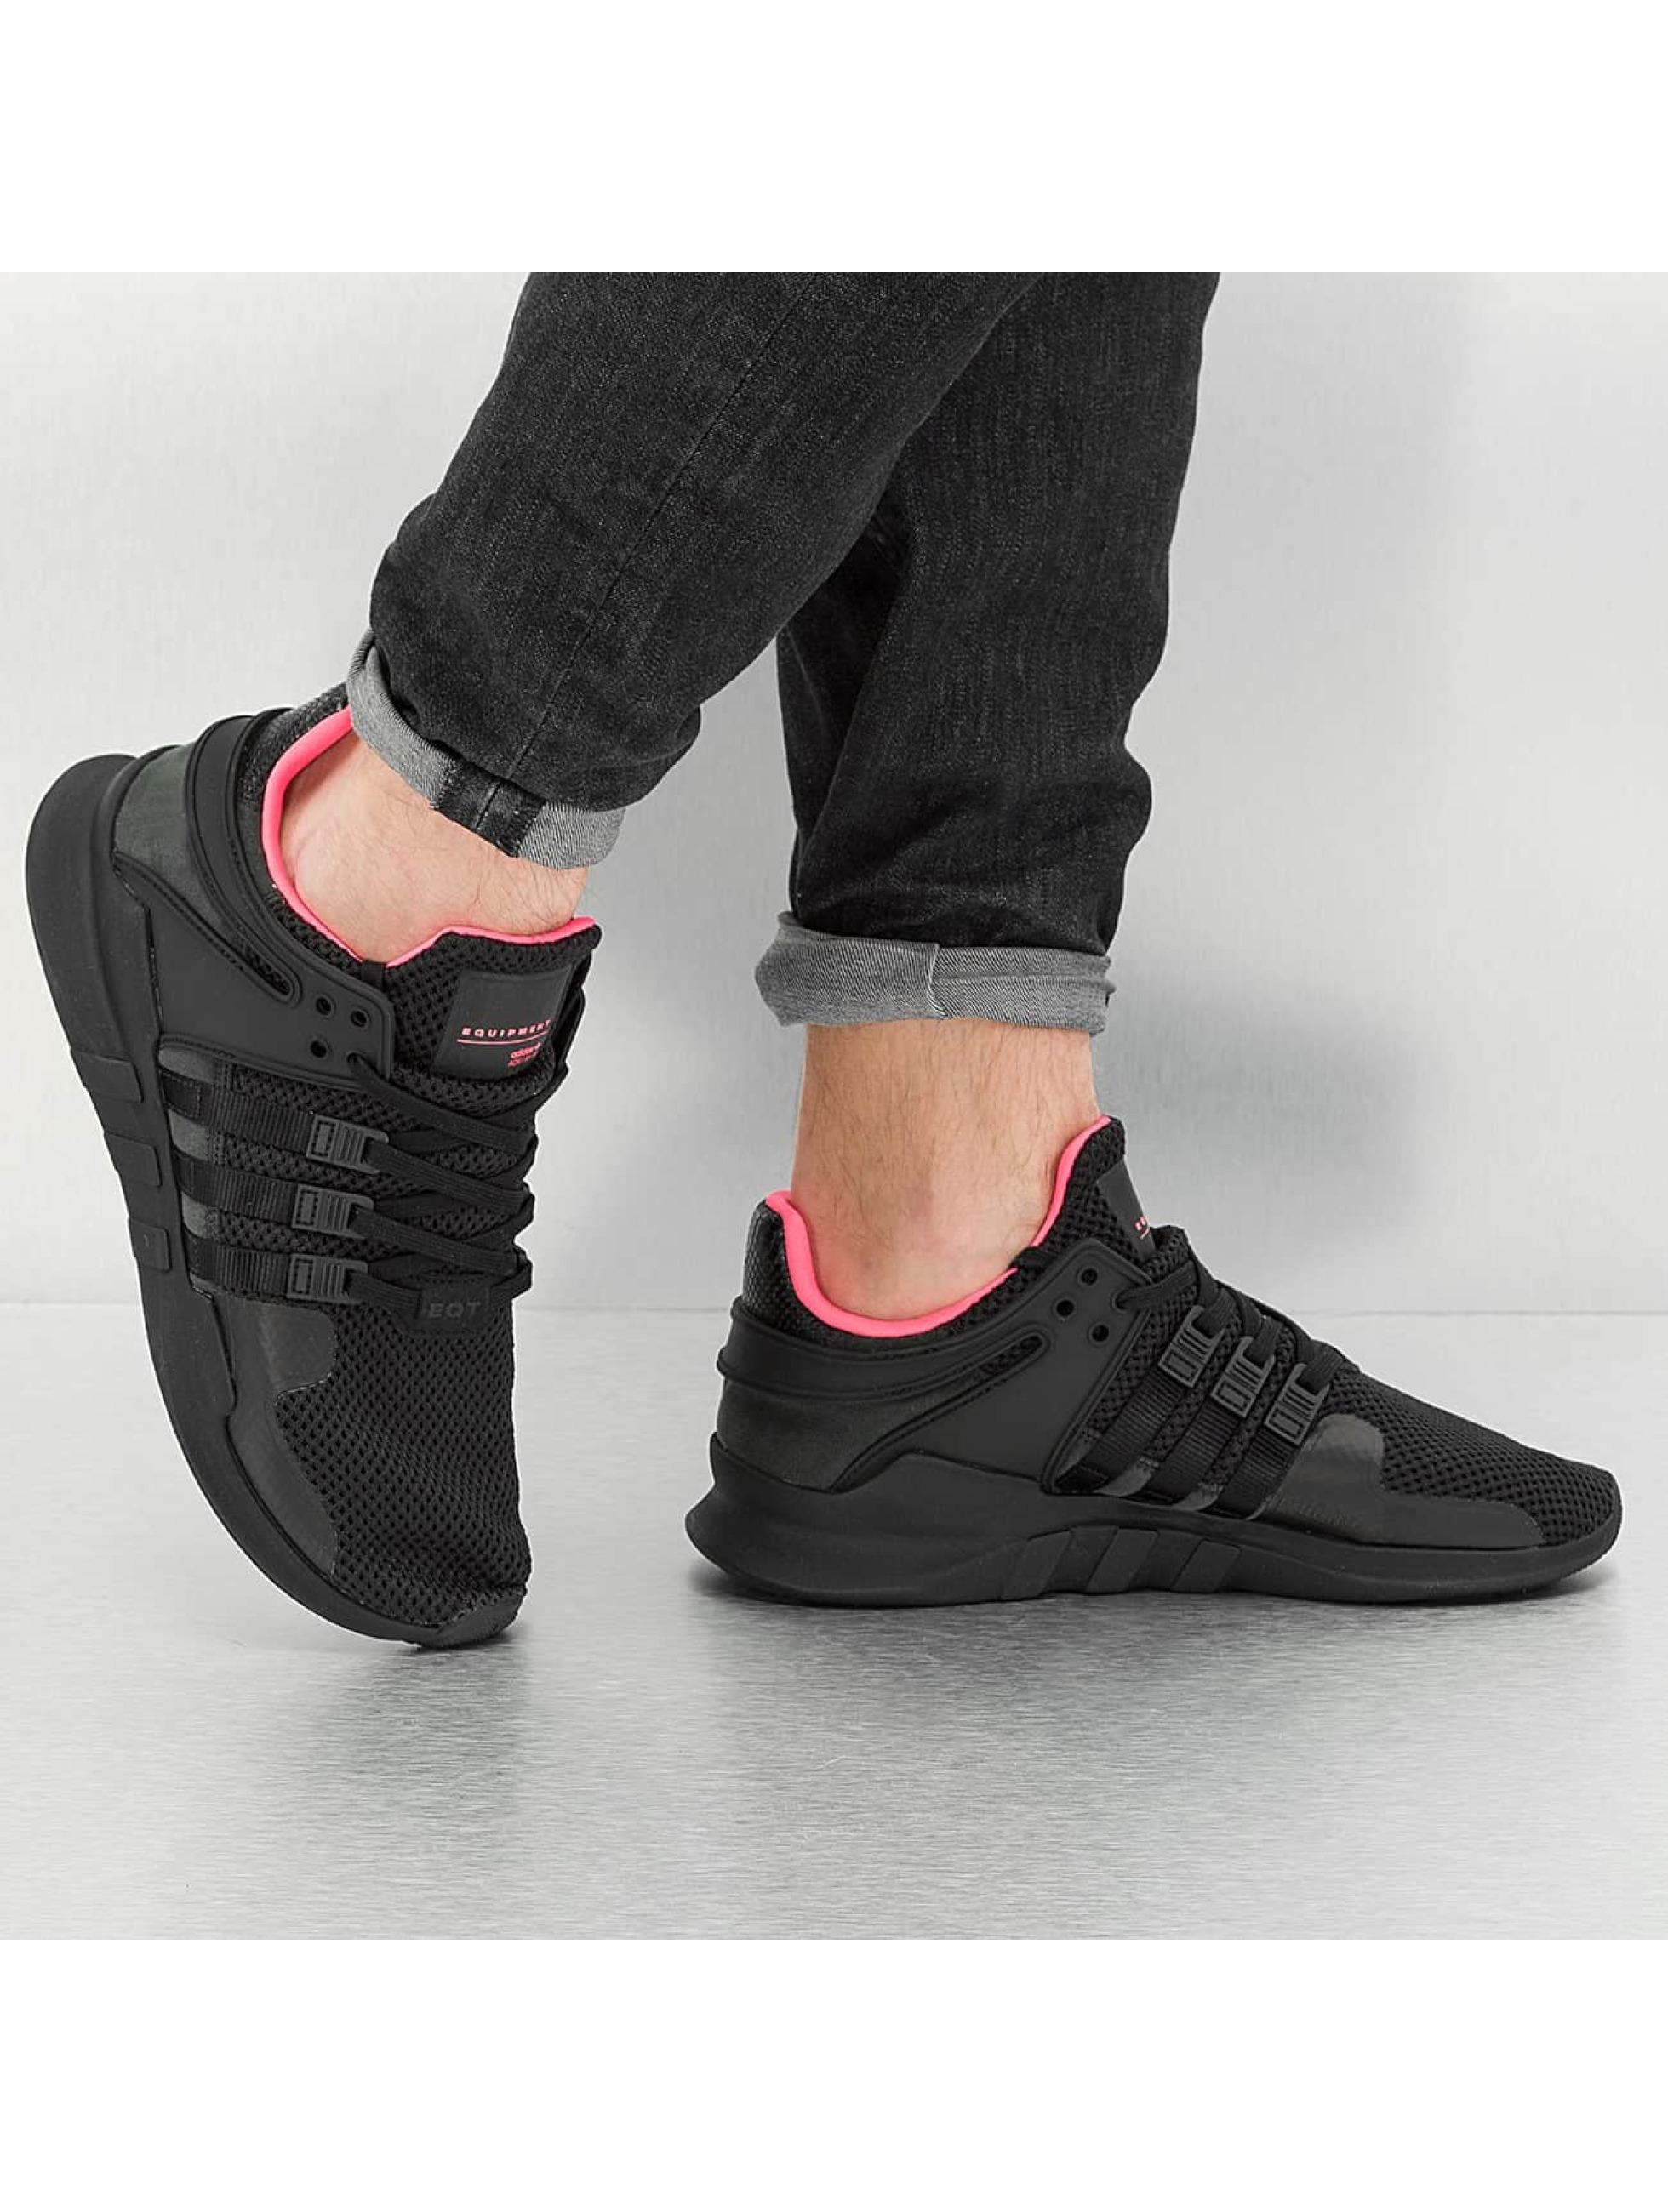 adidas Baskets Equipment Support ADV noir